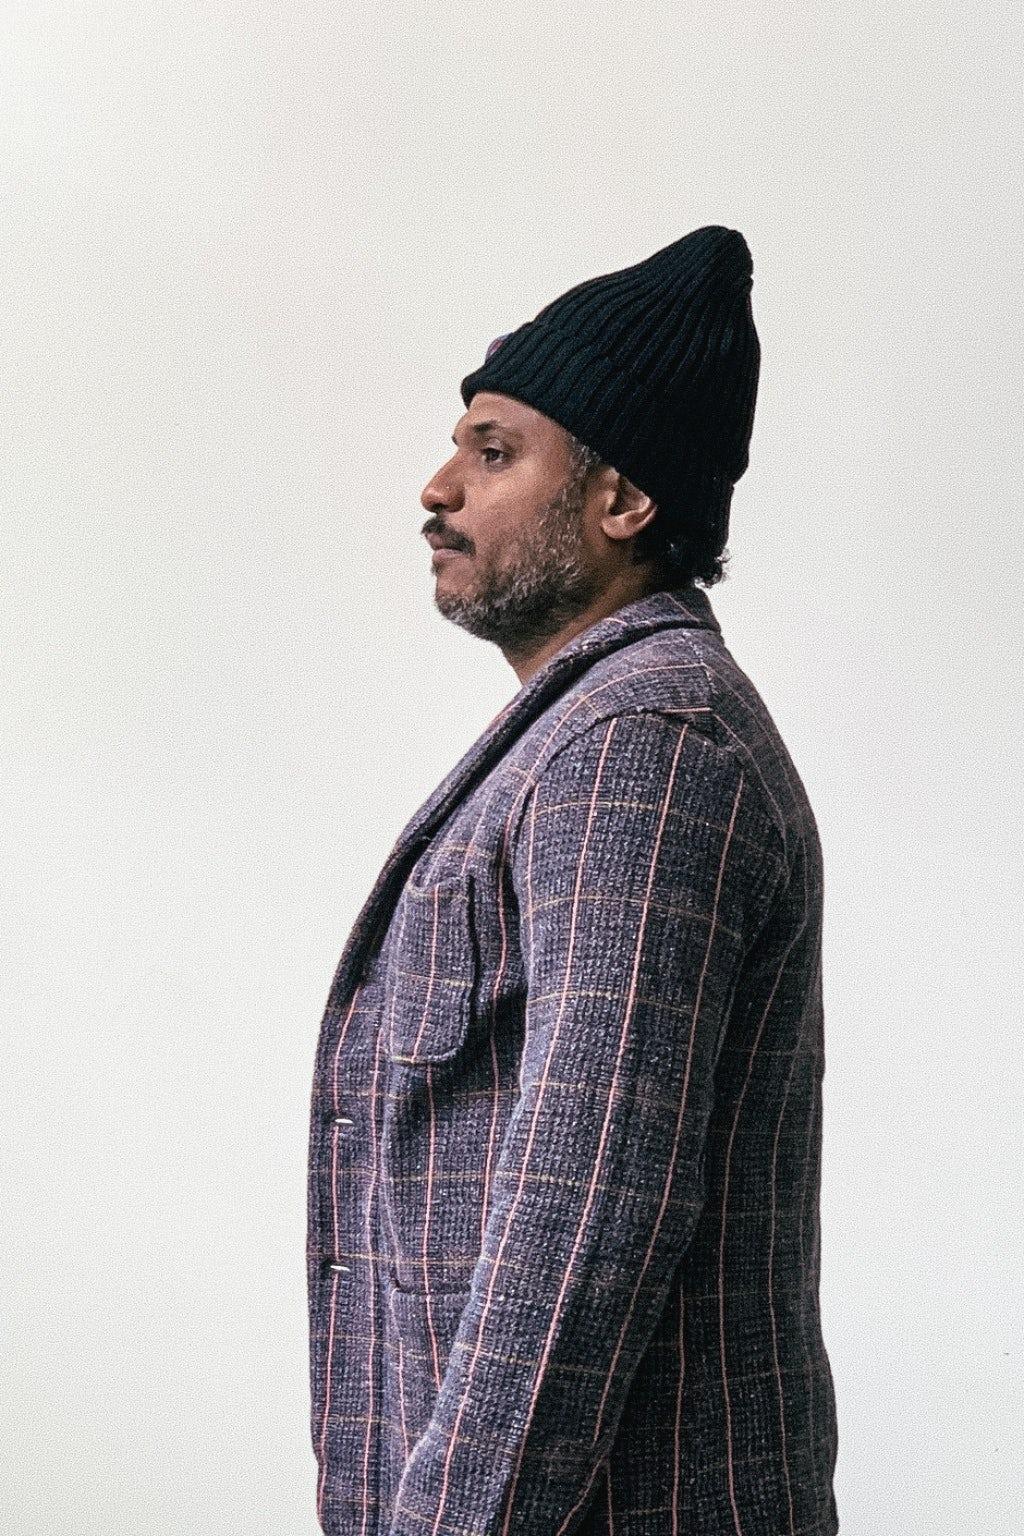 Kapital Tweed Fleecy Knit KOBE Jacket Grey & Pink